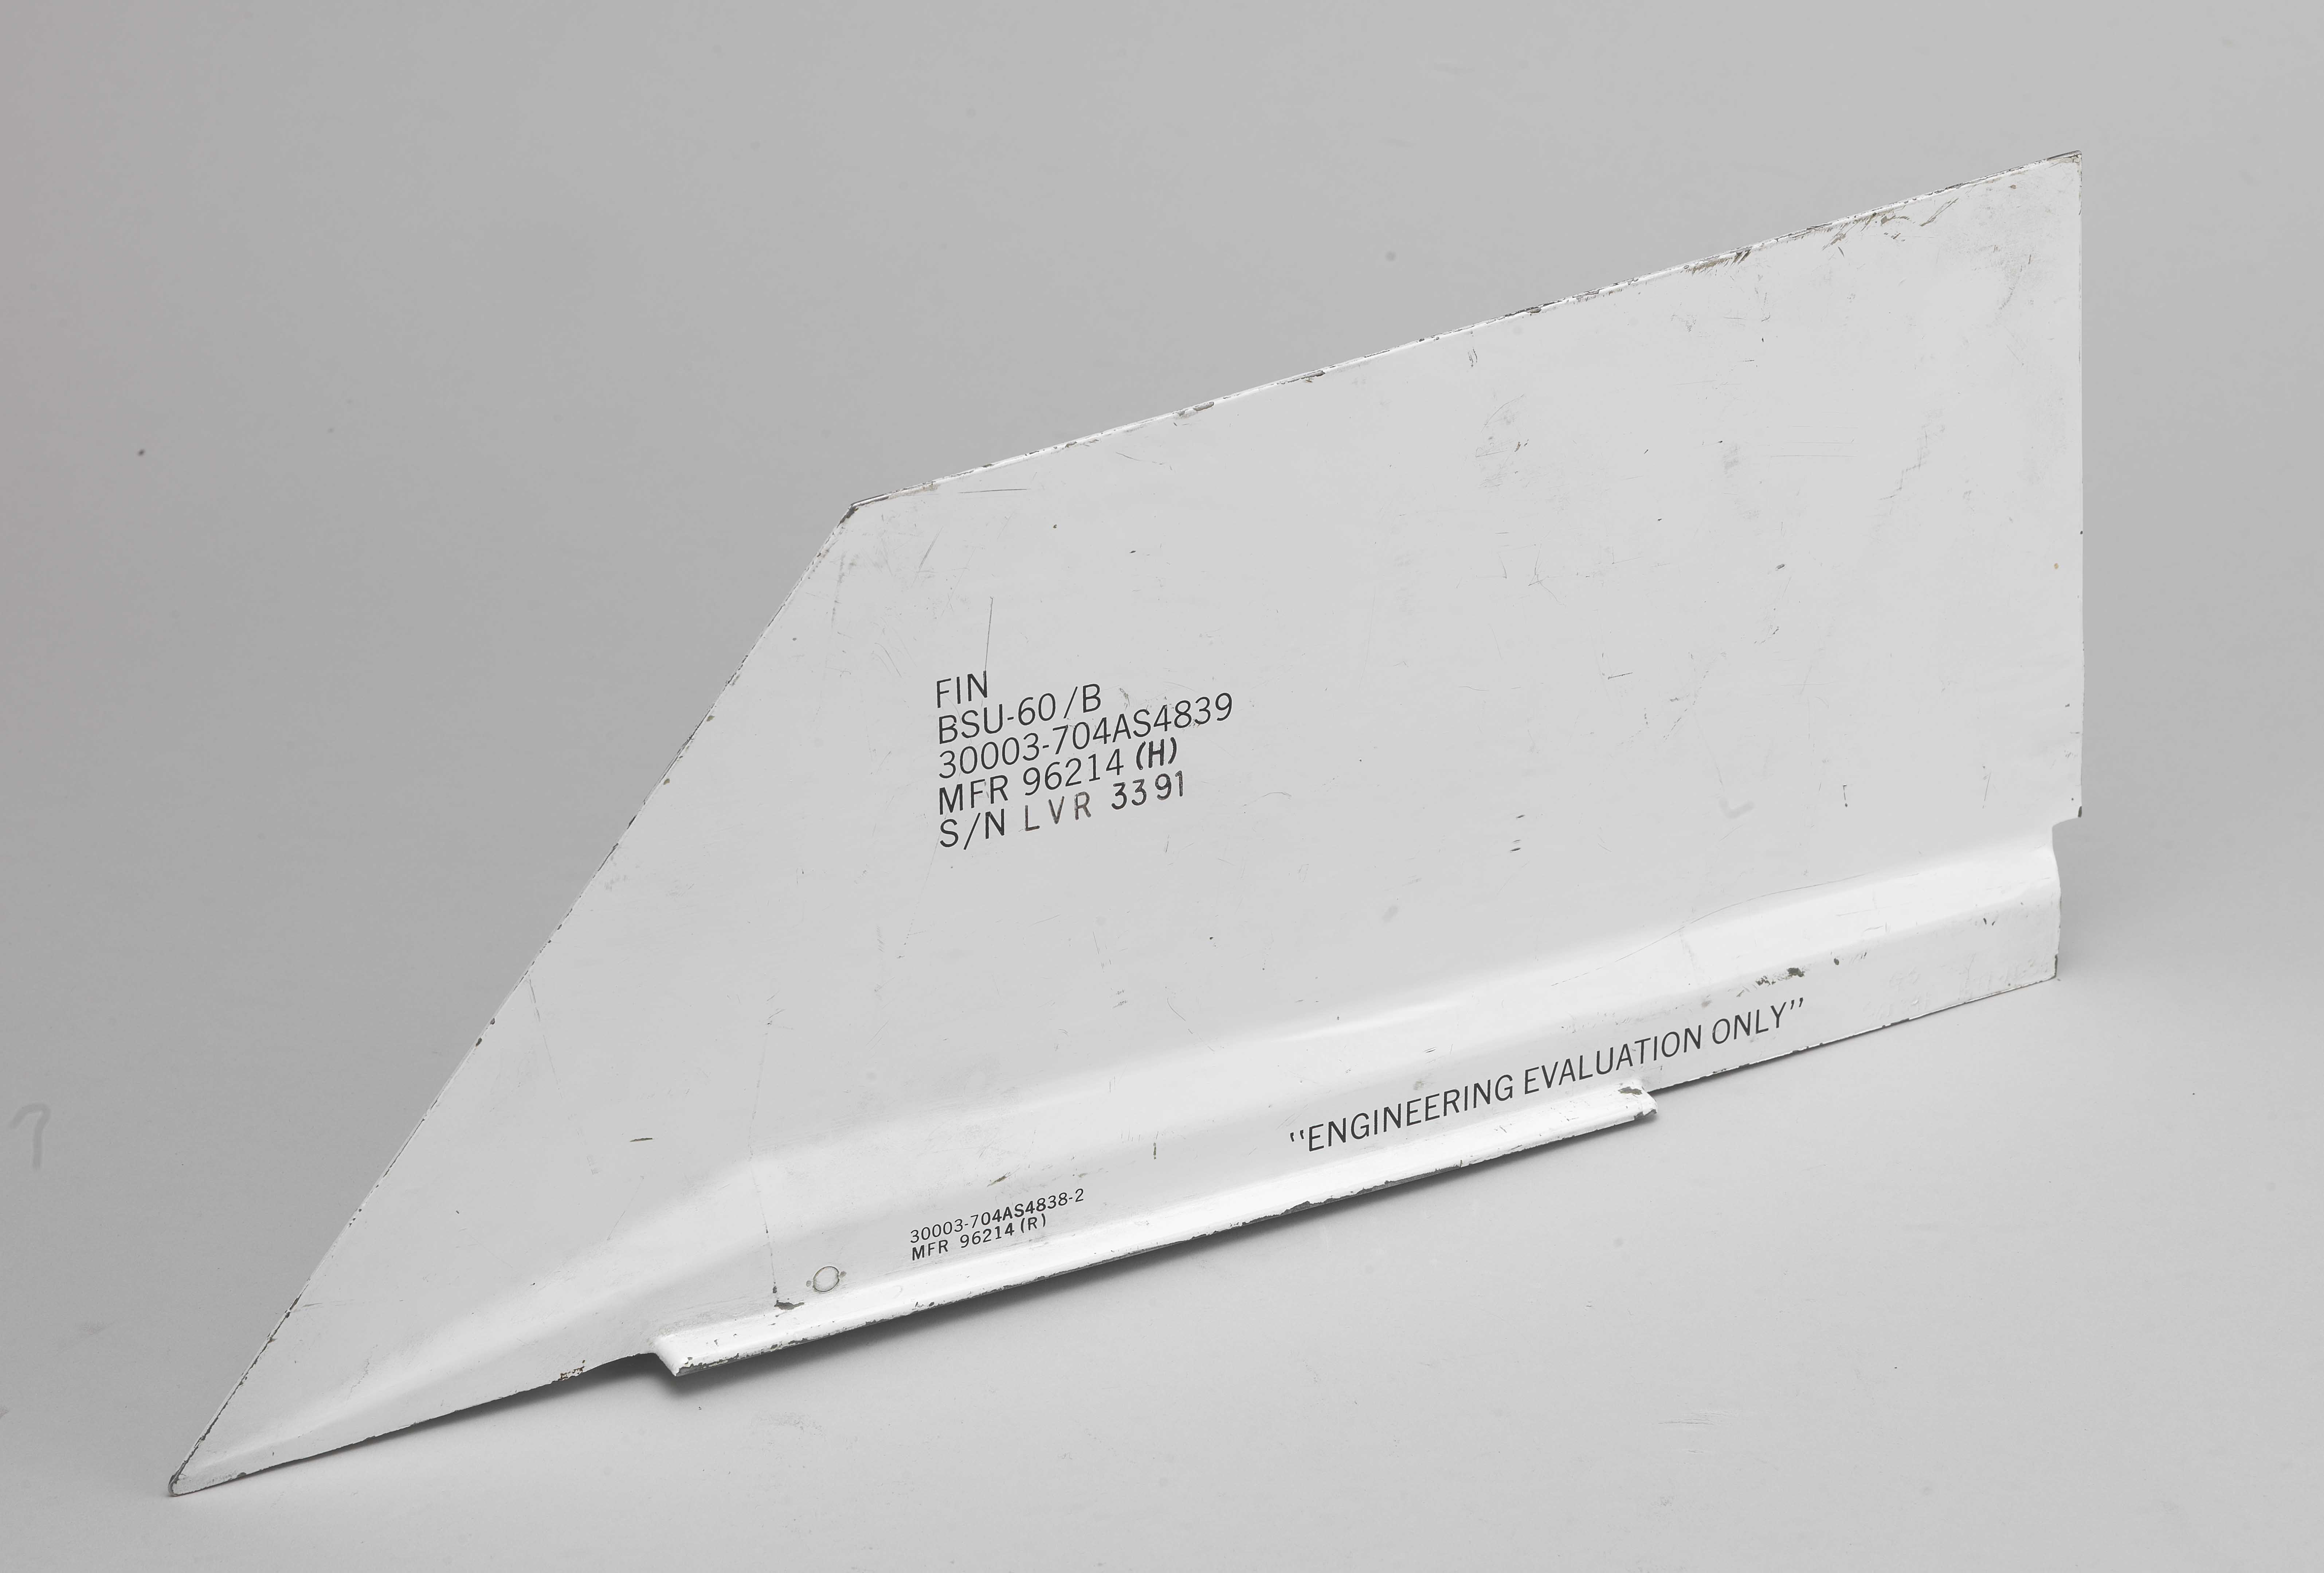 Missle-fins-001